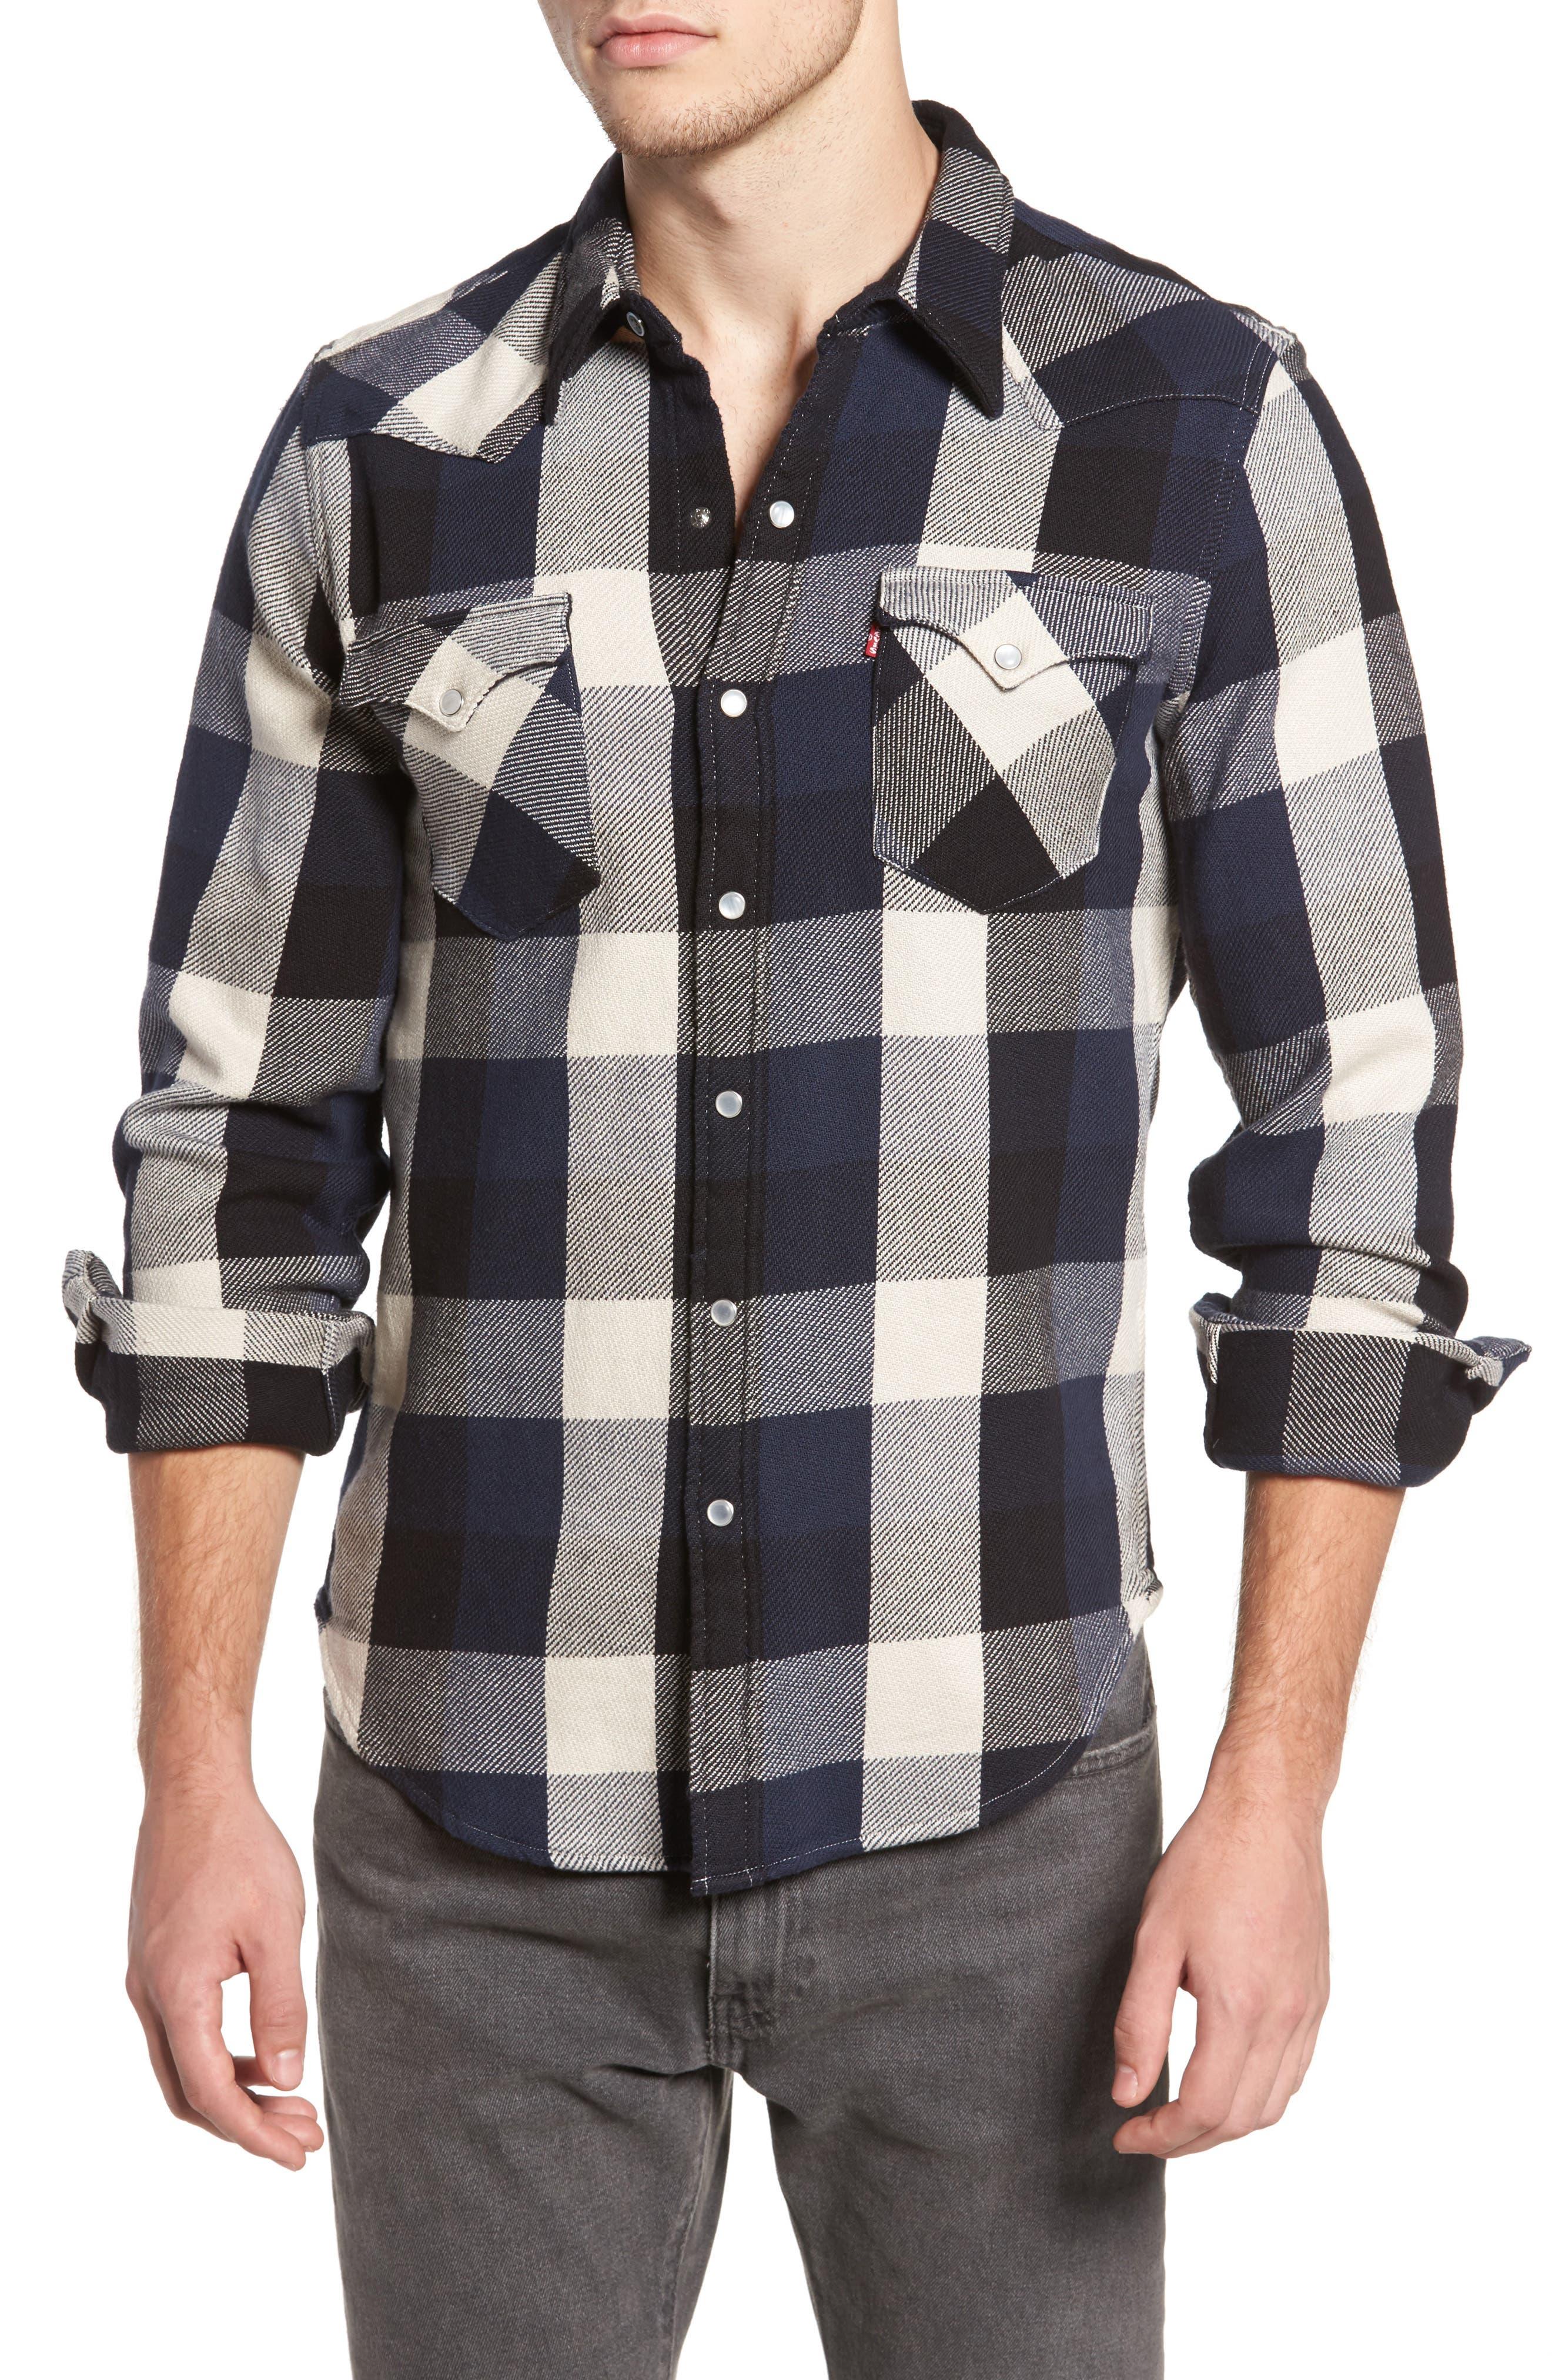 Alternate Image 1 Selected - Levi's® 'Barstow' Denim Western Shirt